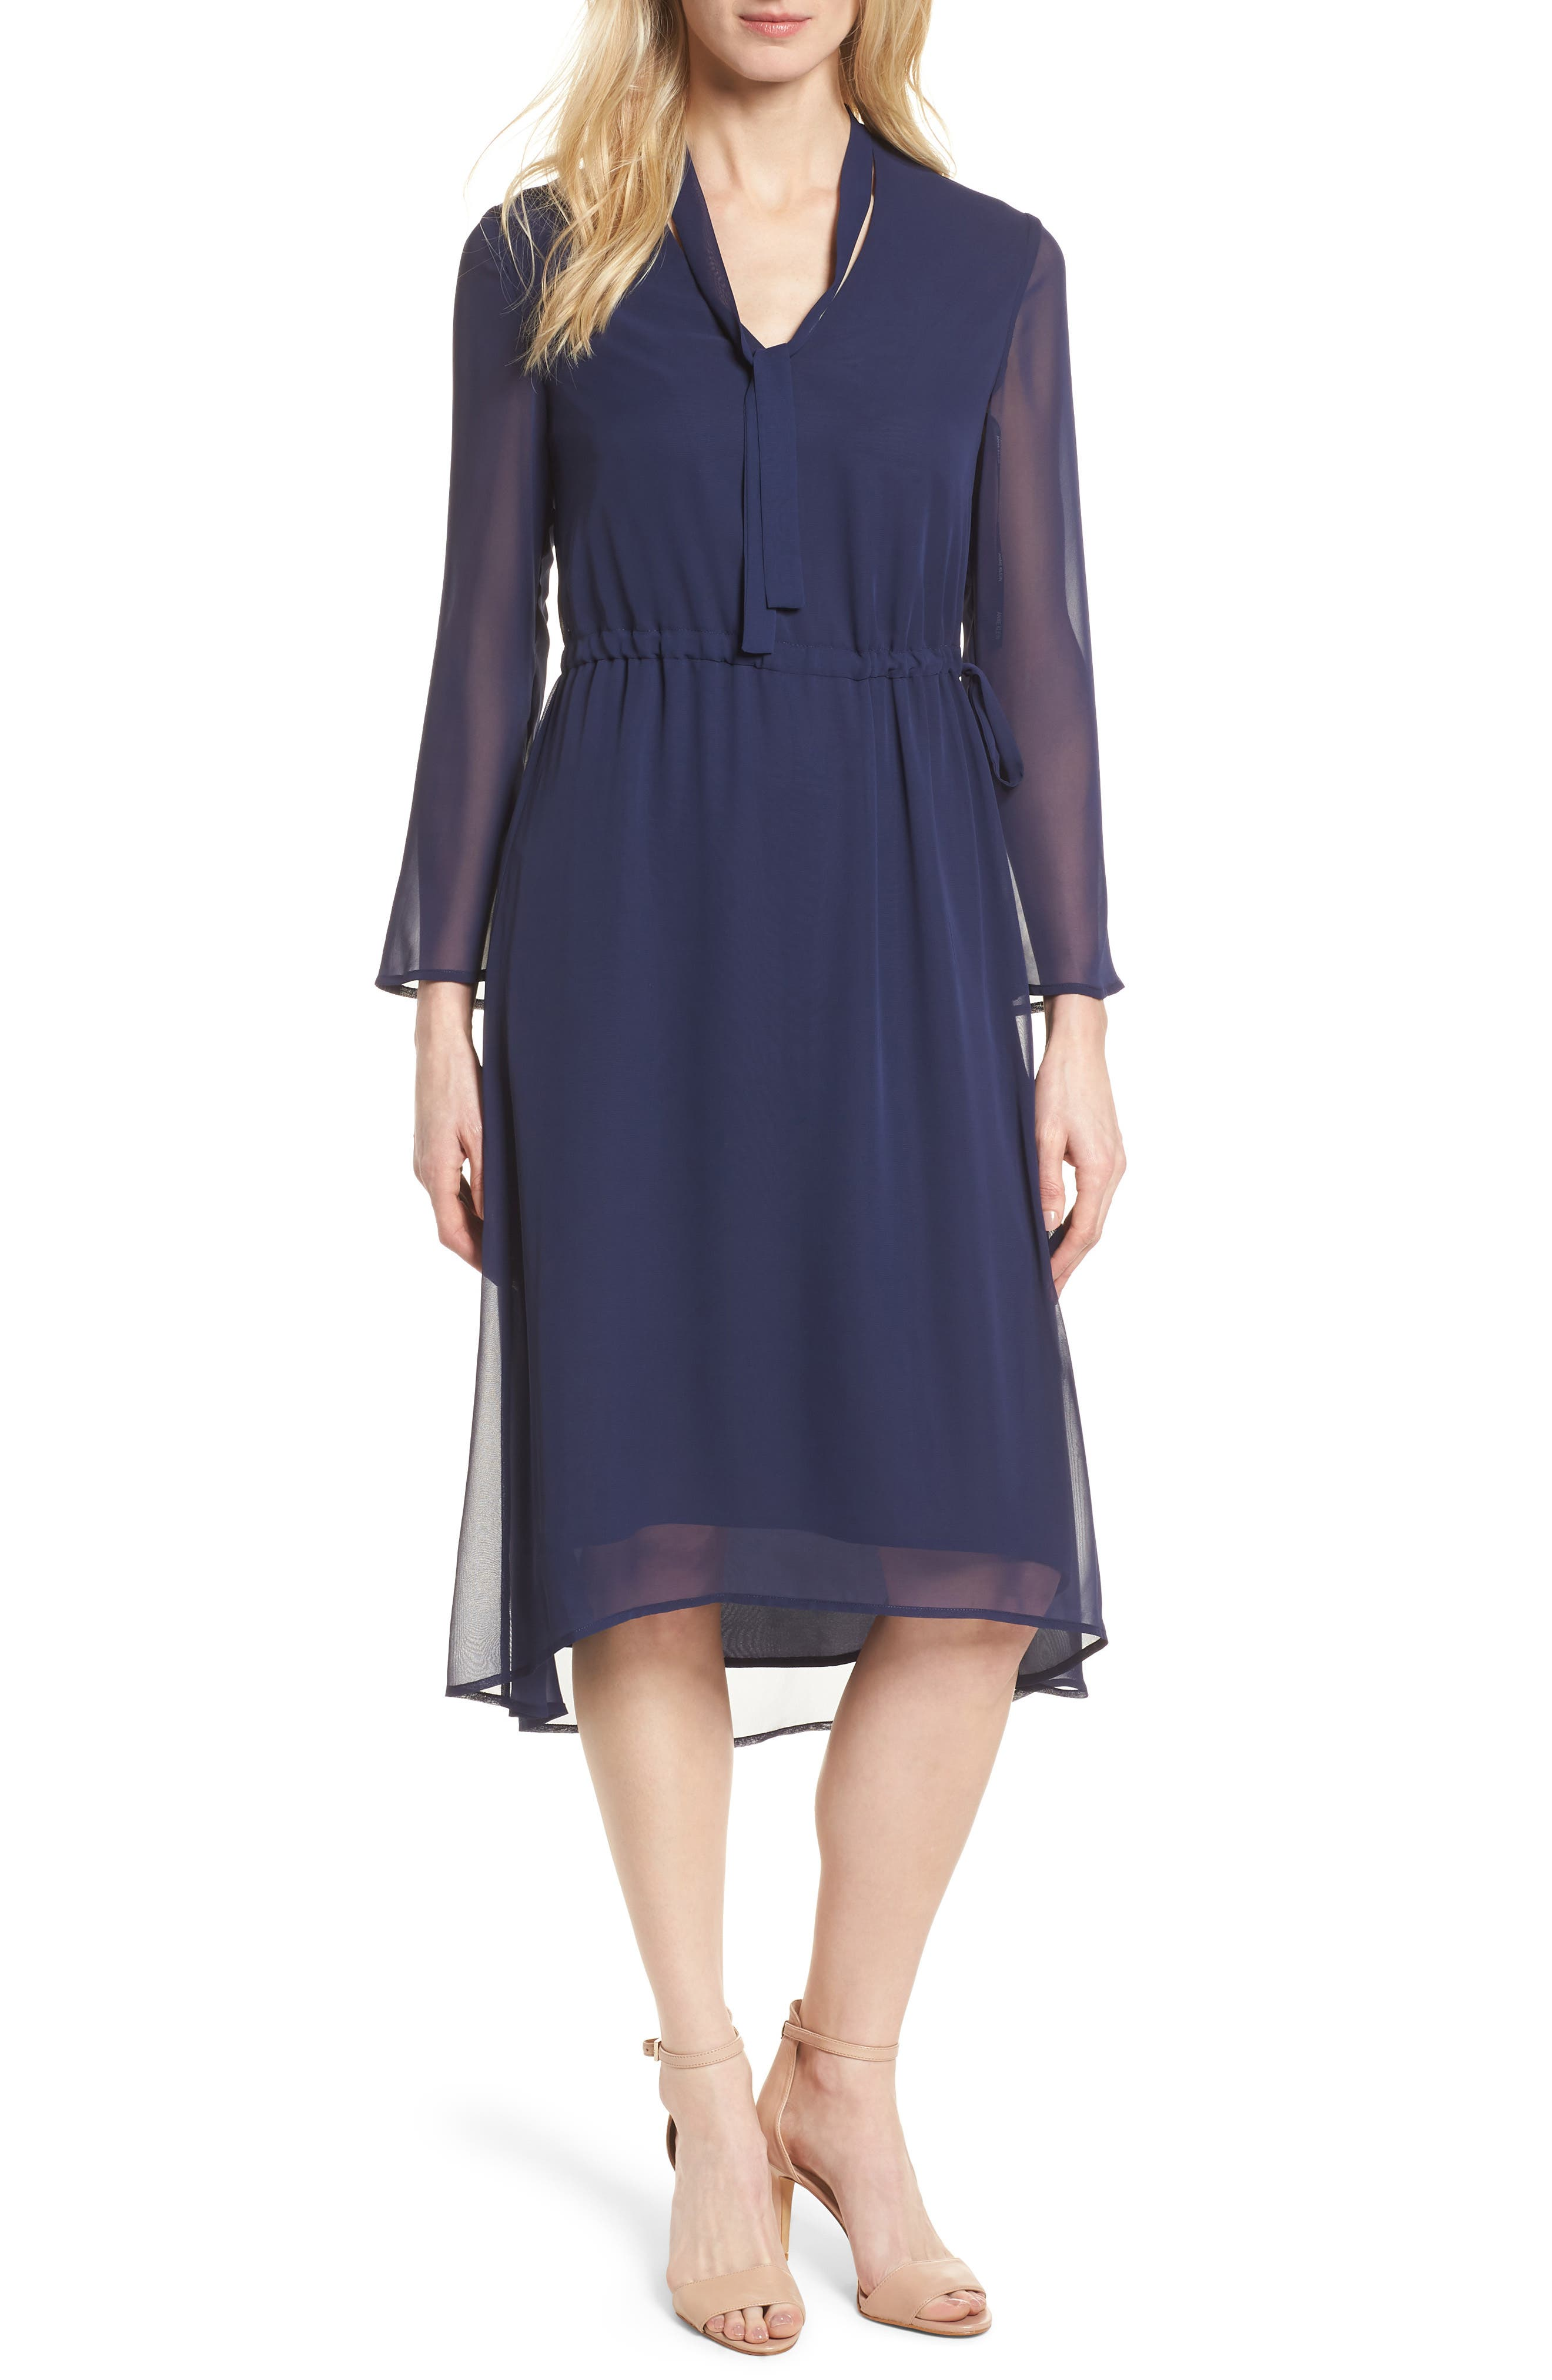 Sheer Overlay Tie Dress,                             Main thumbnail 1, color,                             Breton Blue